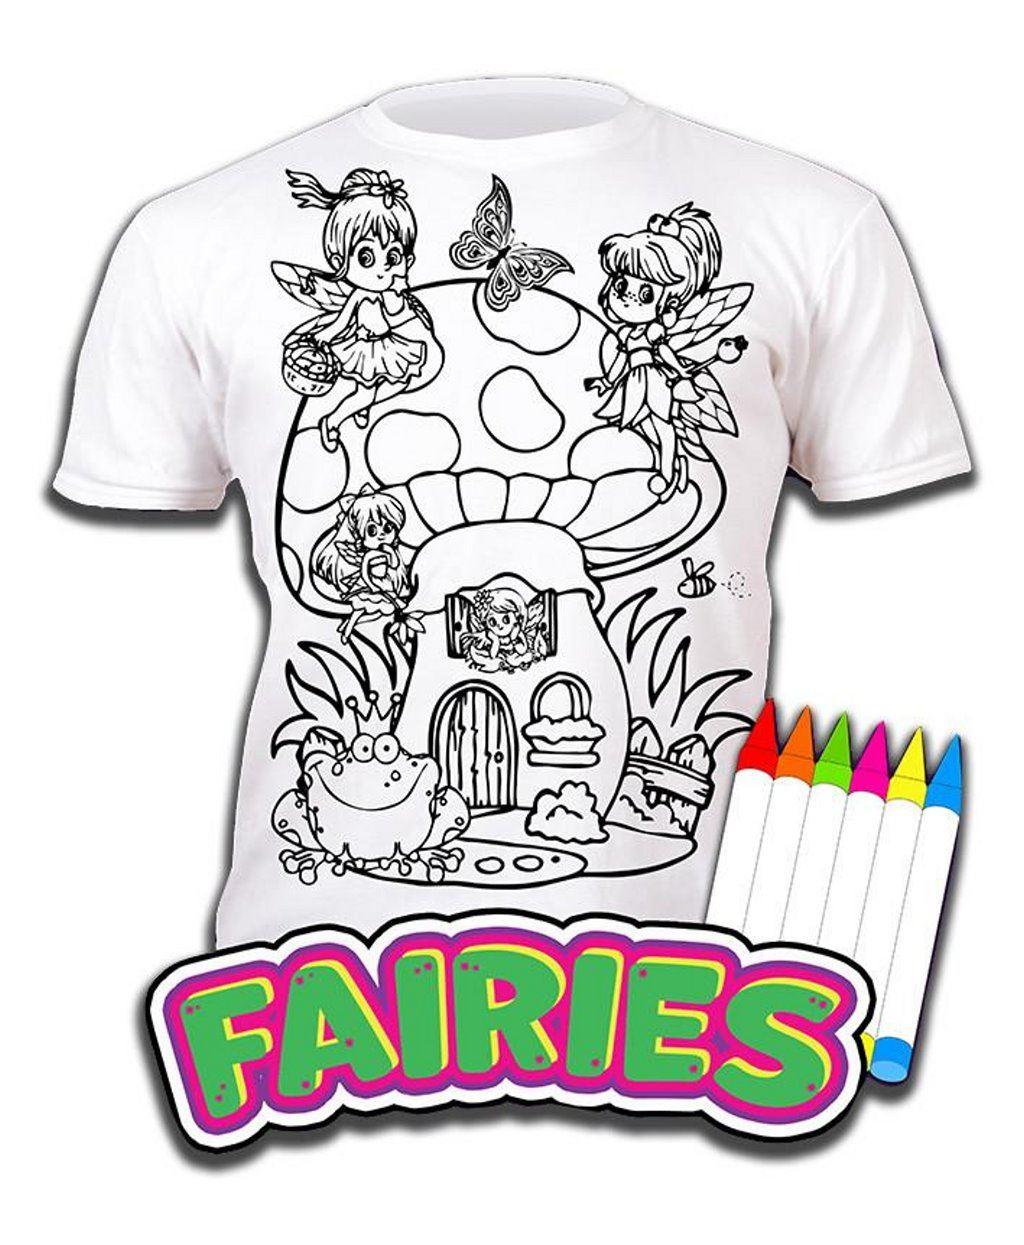 Colour-your-own-t-shirt-unicorn-mermaid-dinosaur-novelty-gift thumbnail 6